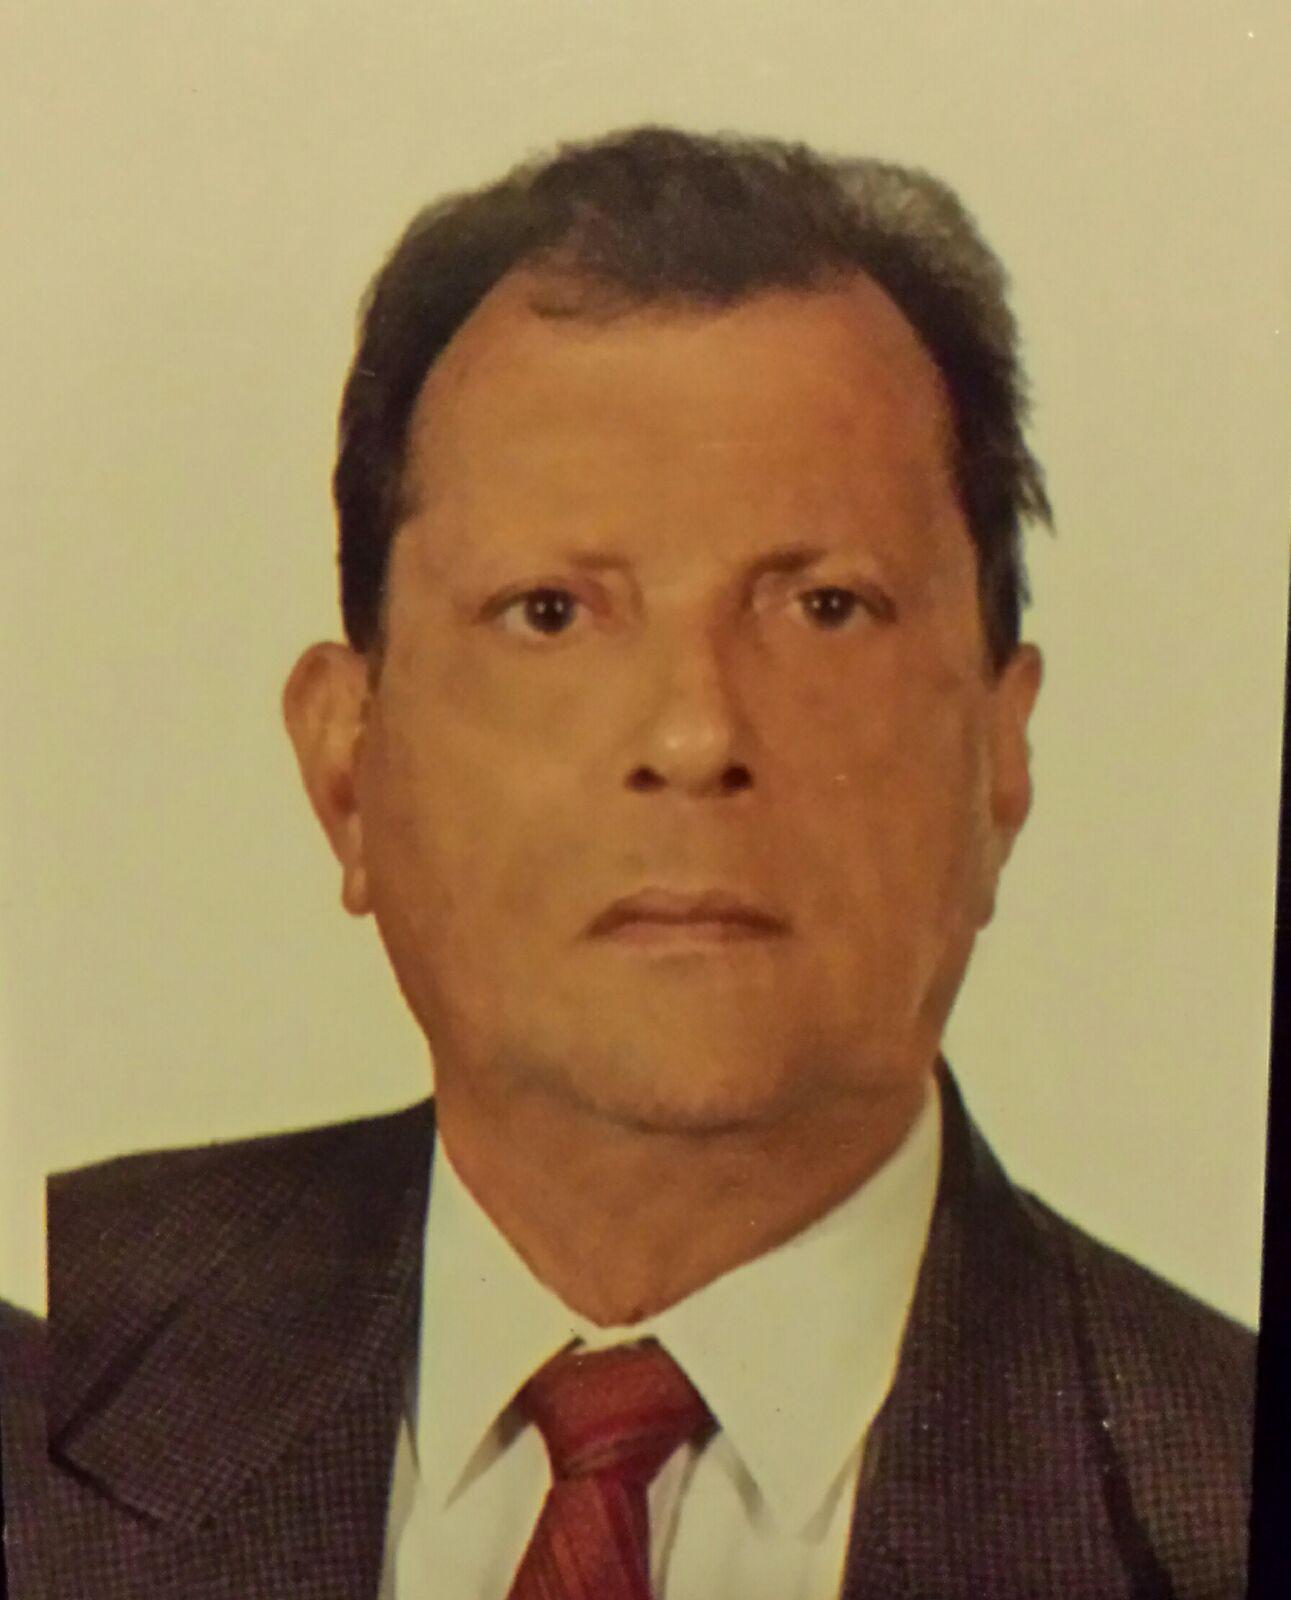 Antonio Sánchez Hernández